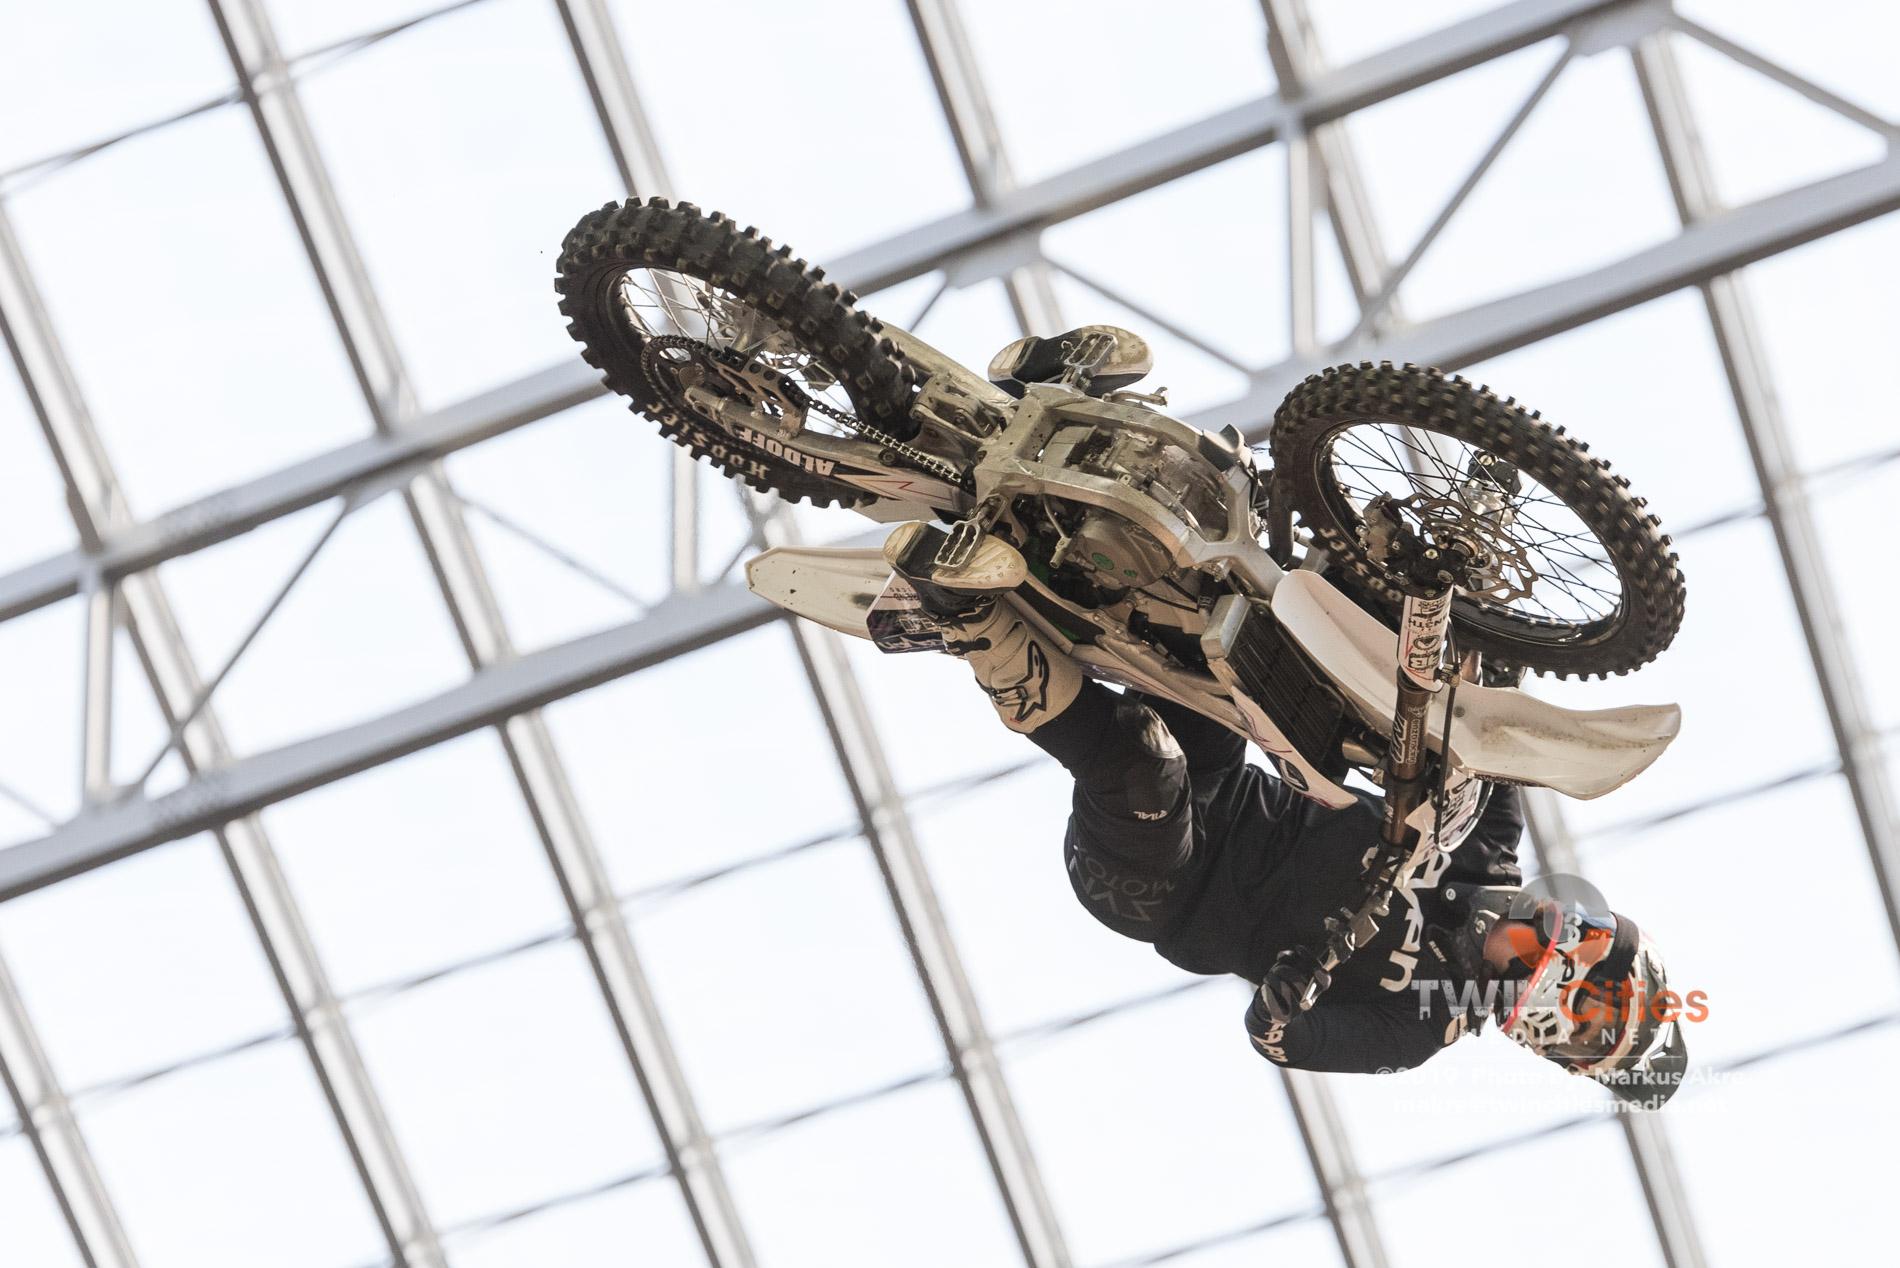 2019-X-Games-Day-1-Moto-X-Practice-3